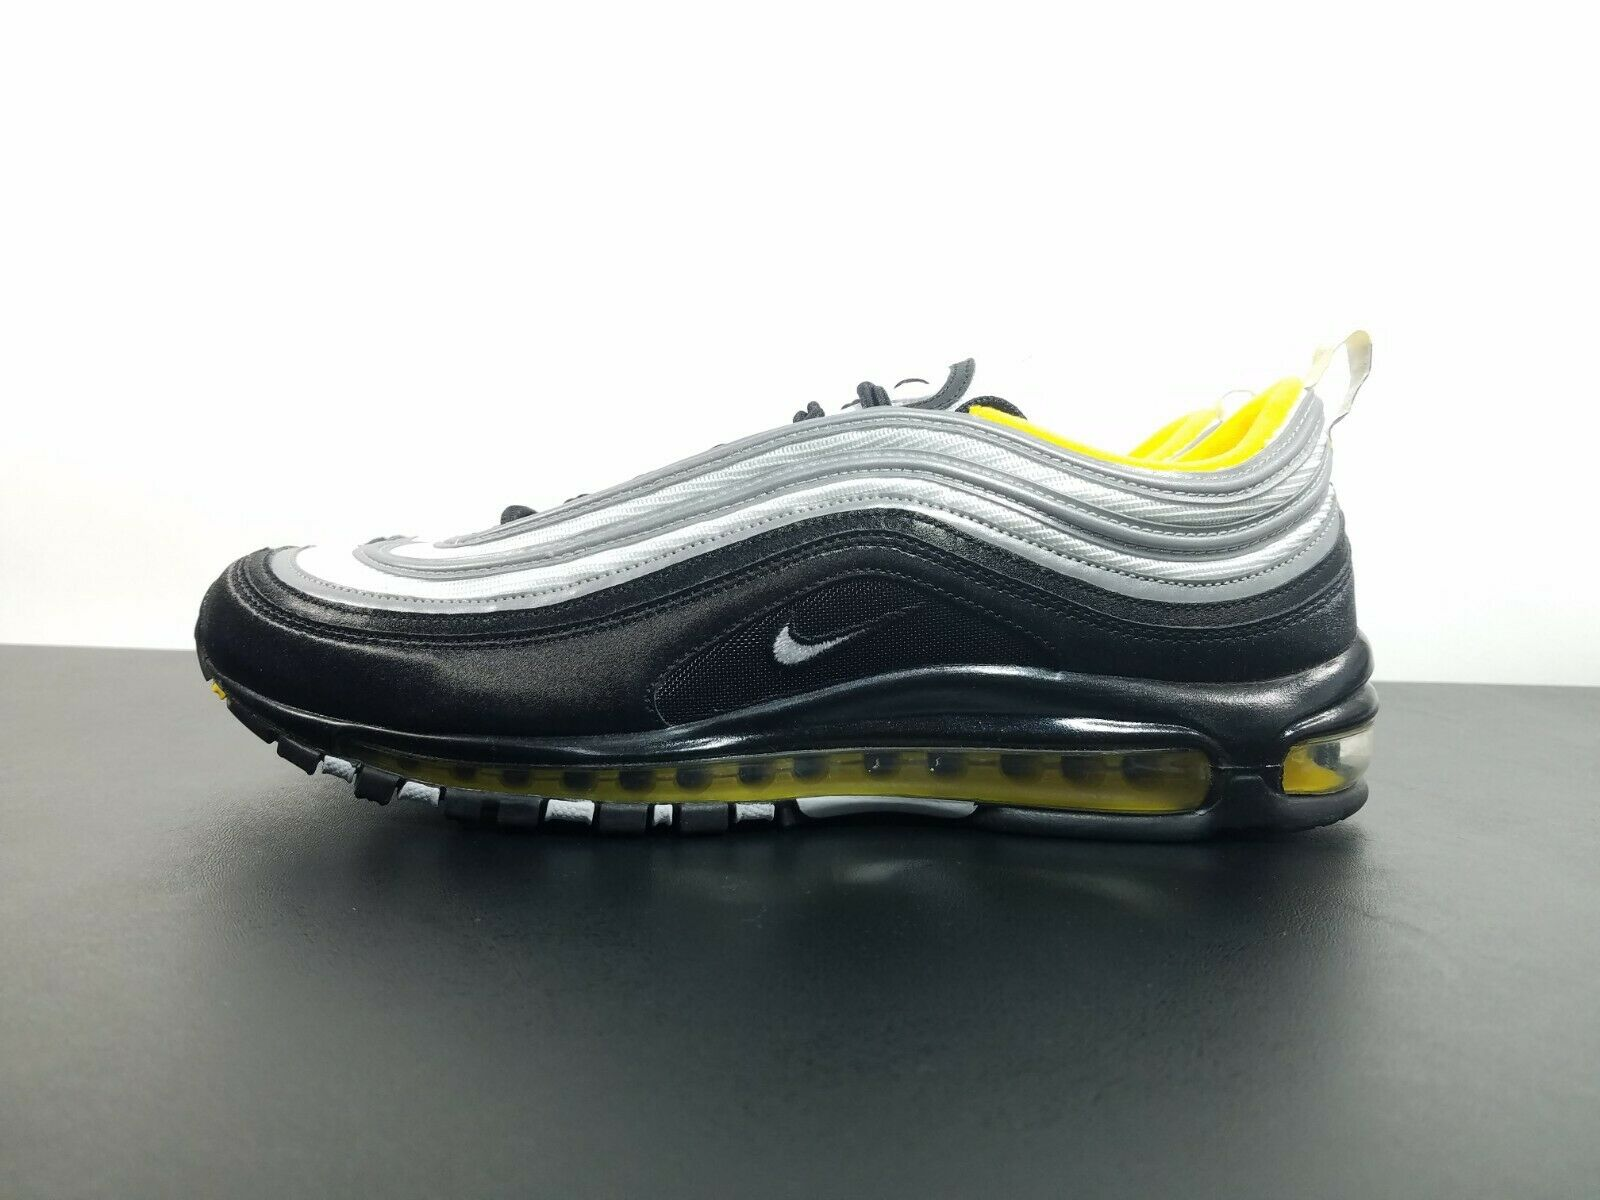 Nike Air Max 97 Black Yellow Pittsburgh Steelers 921826 008 Size 10 Mens